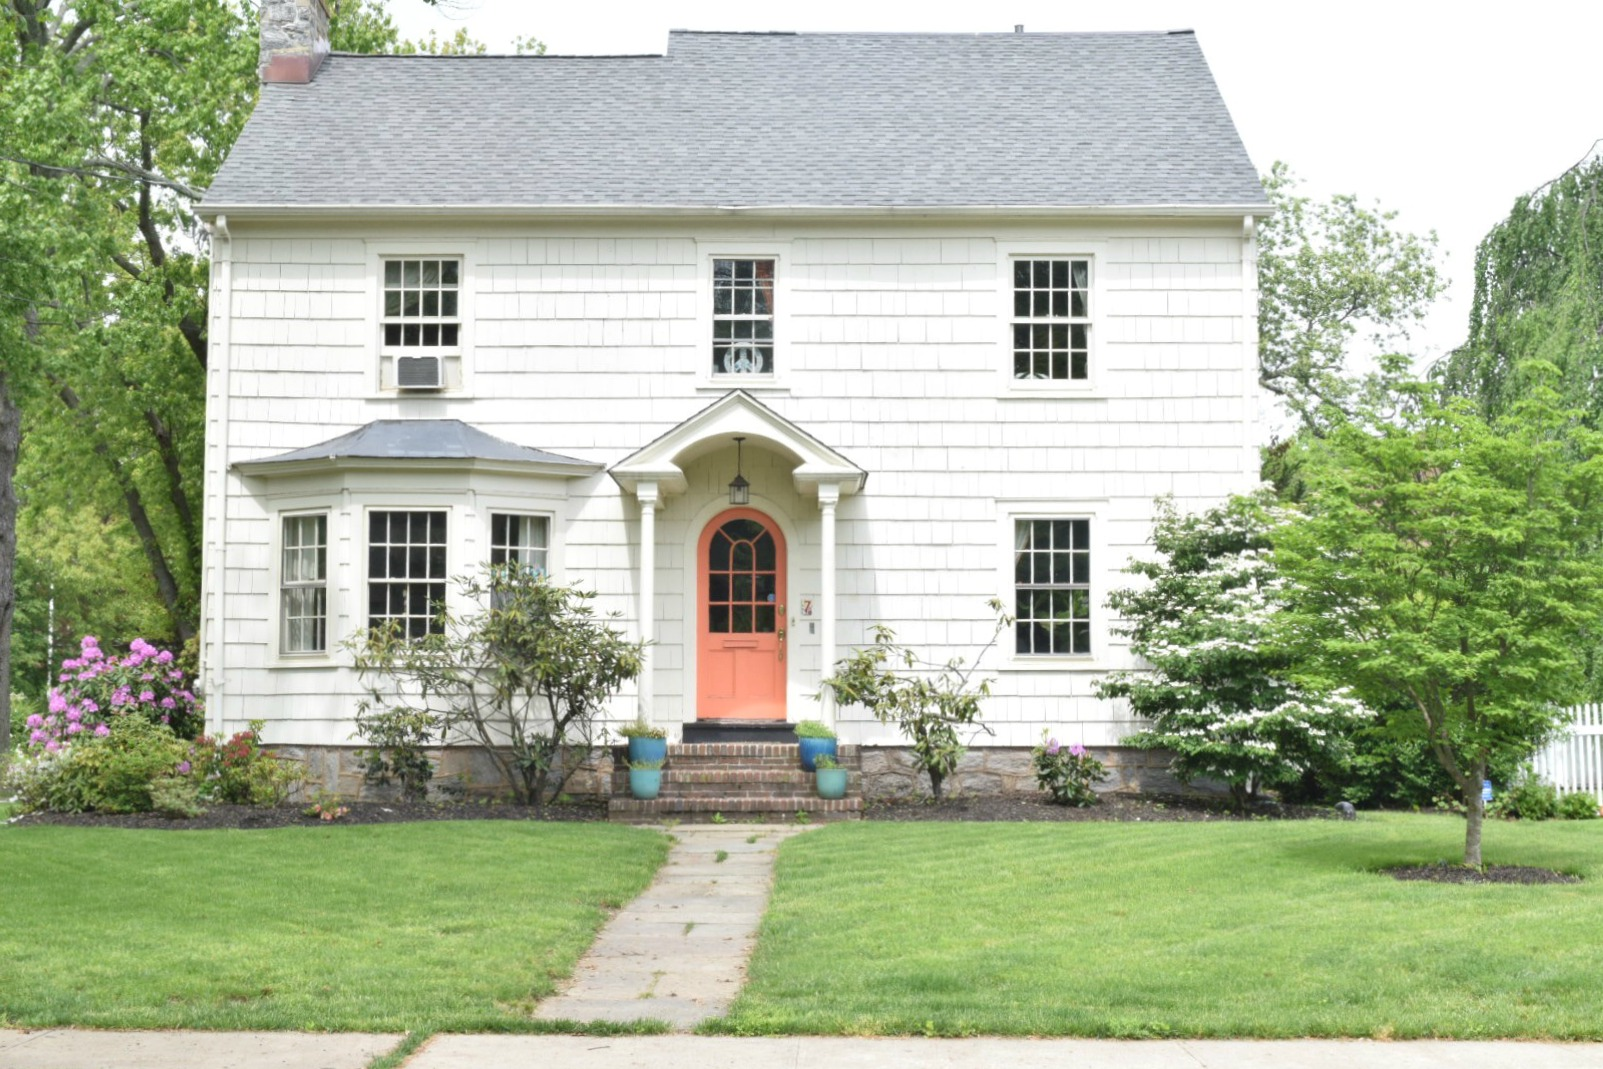 New England Homes- Exterior Paint Color Ideas